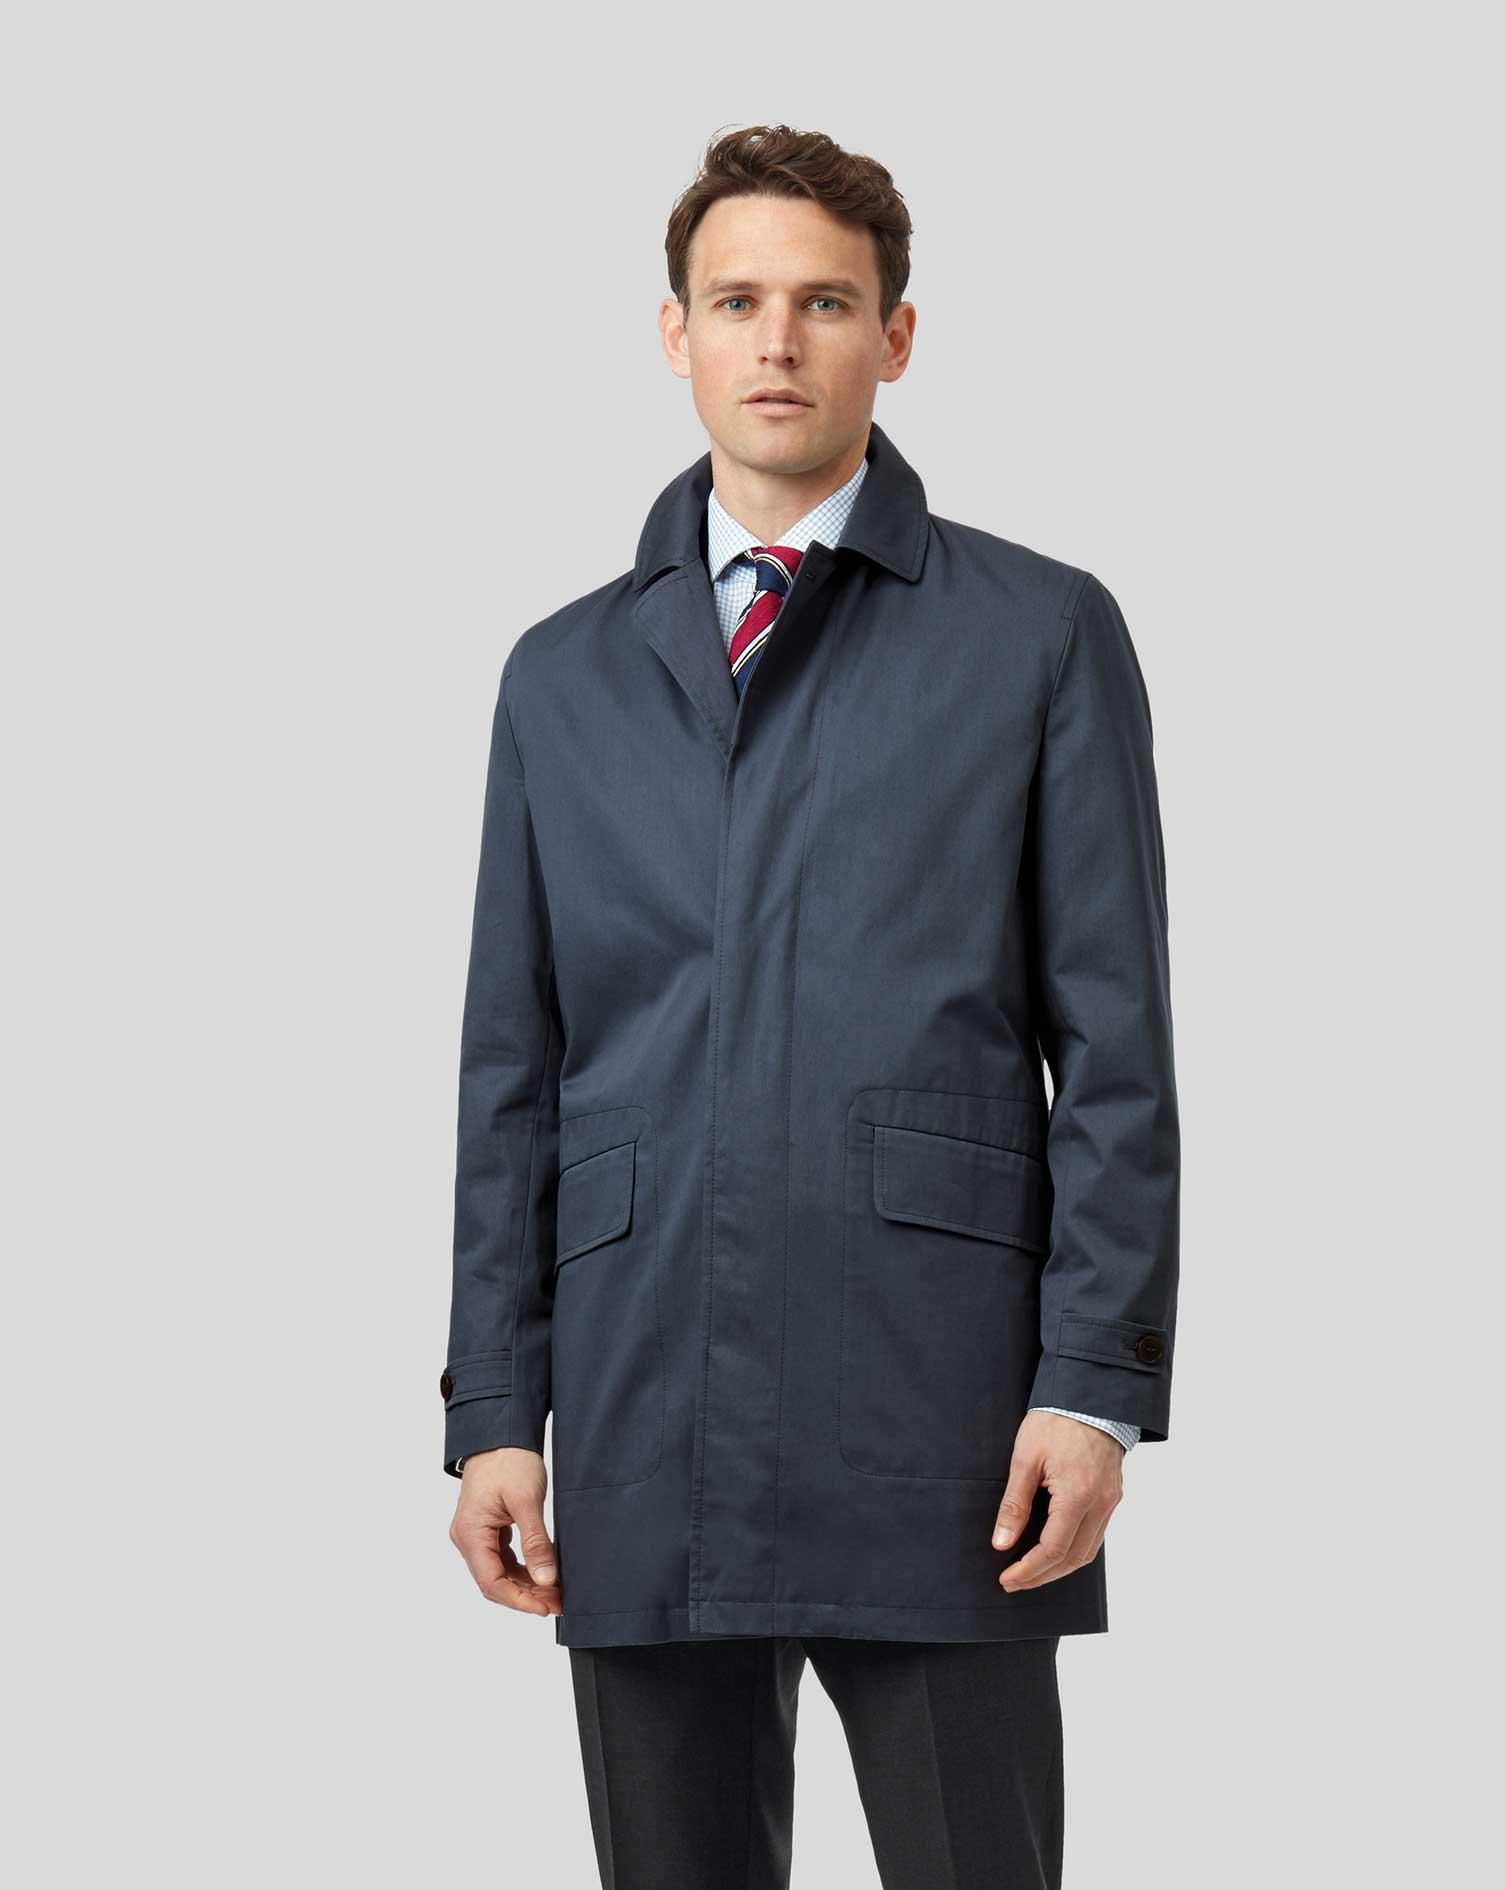 Airforce Blue Italian RainCotton coat Size 42 Regular by Charles Tyrwhitt